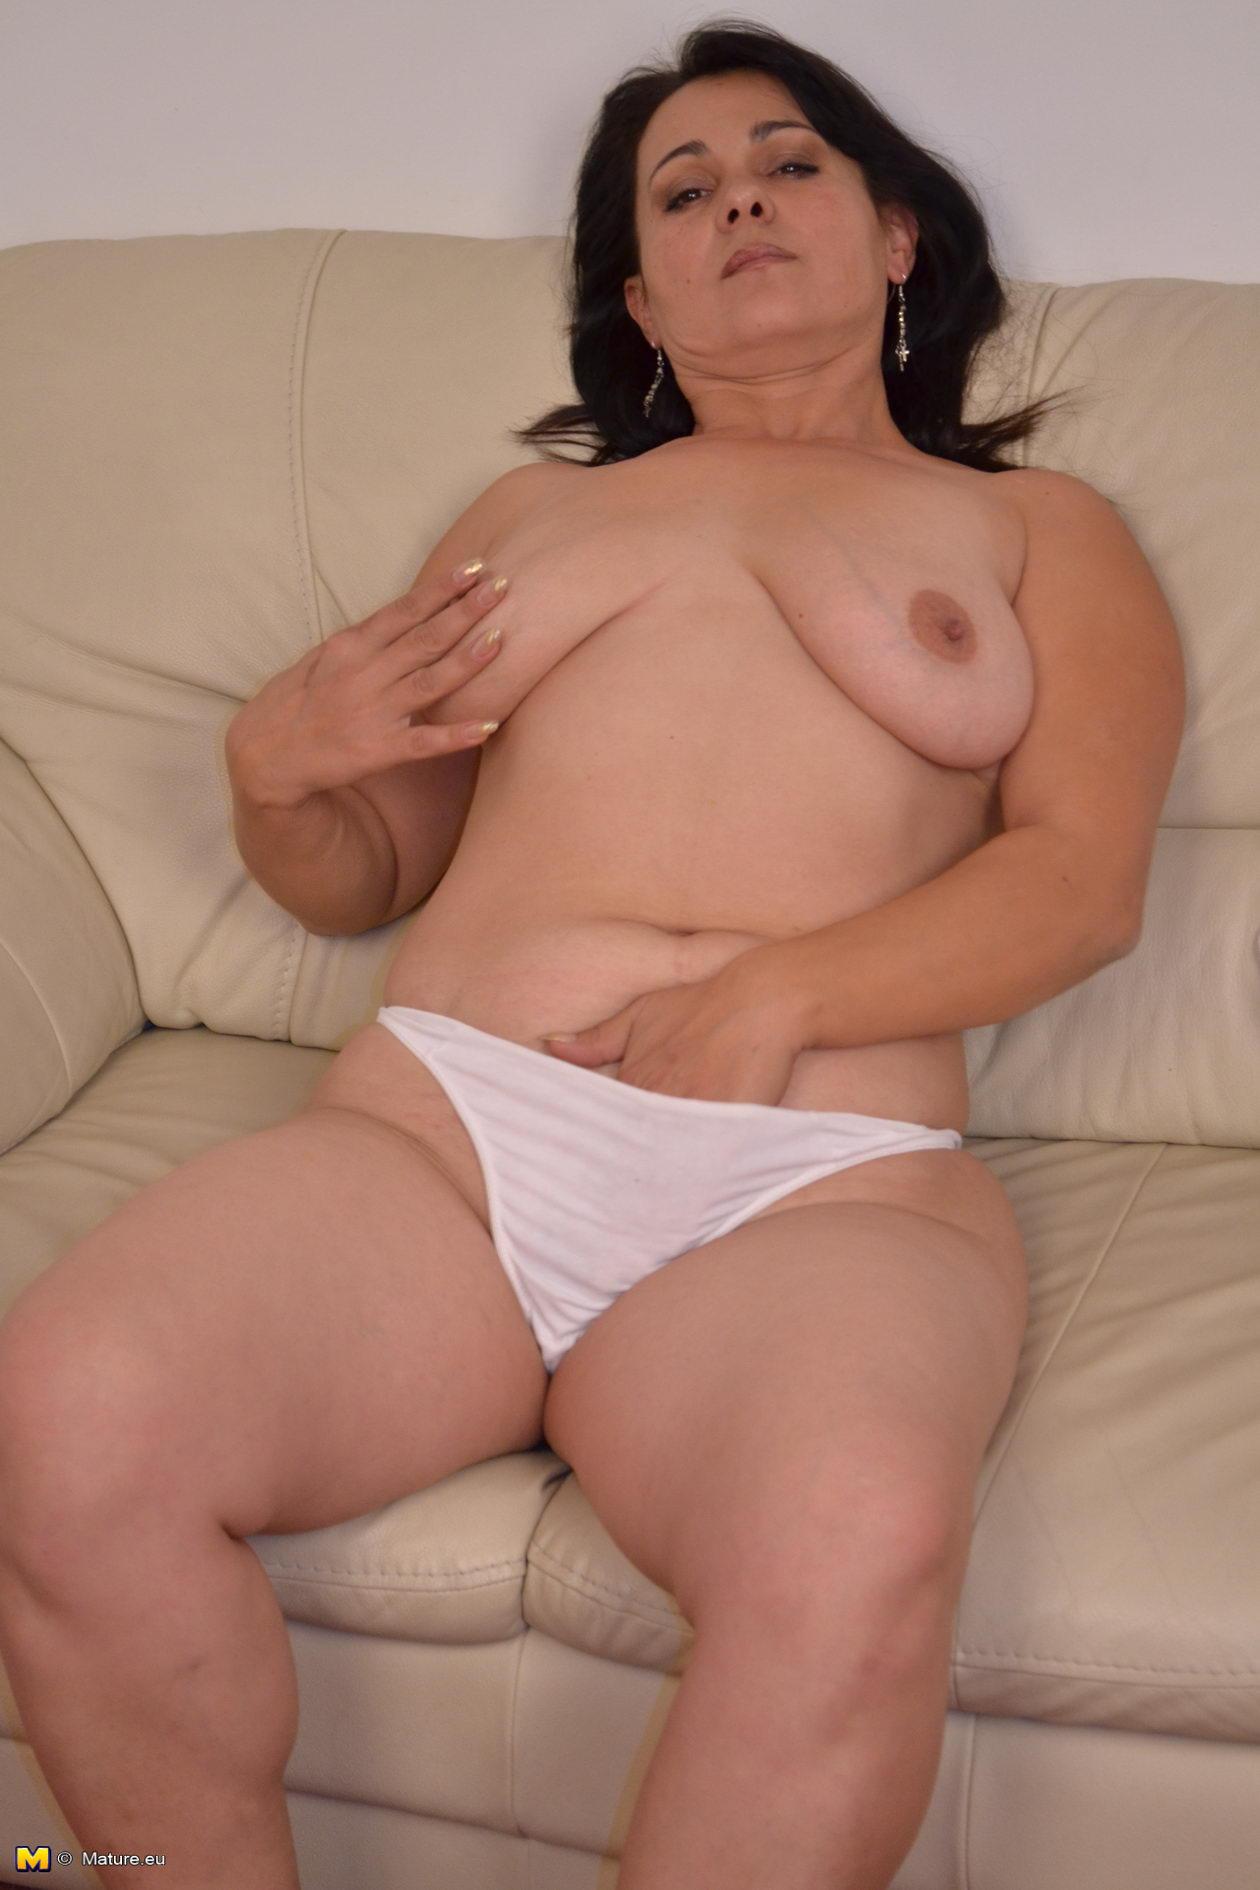 Nude pose in public